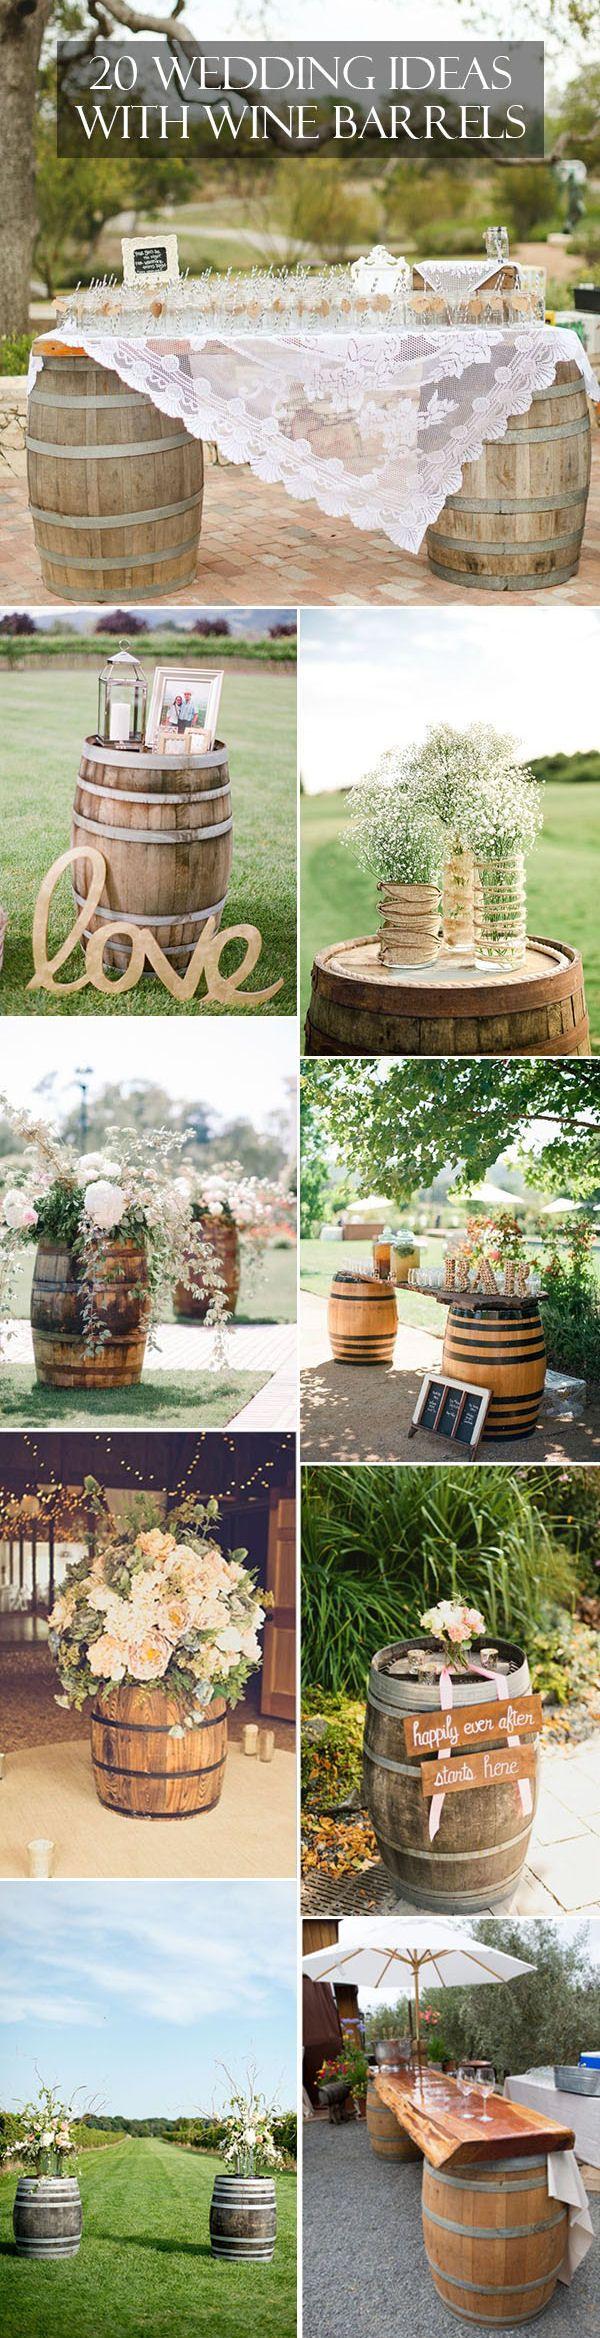 Country Wedding Ideas `✿. 20 Ways To Use Wine Barrels